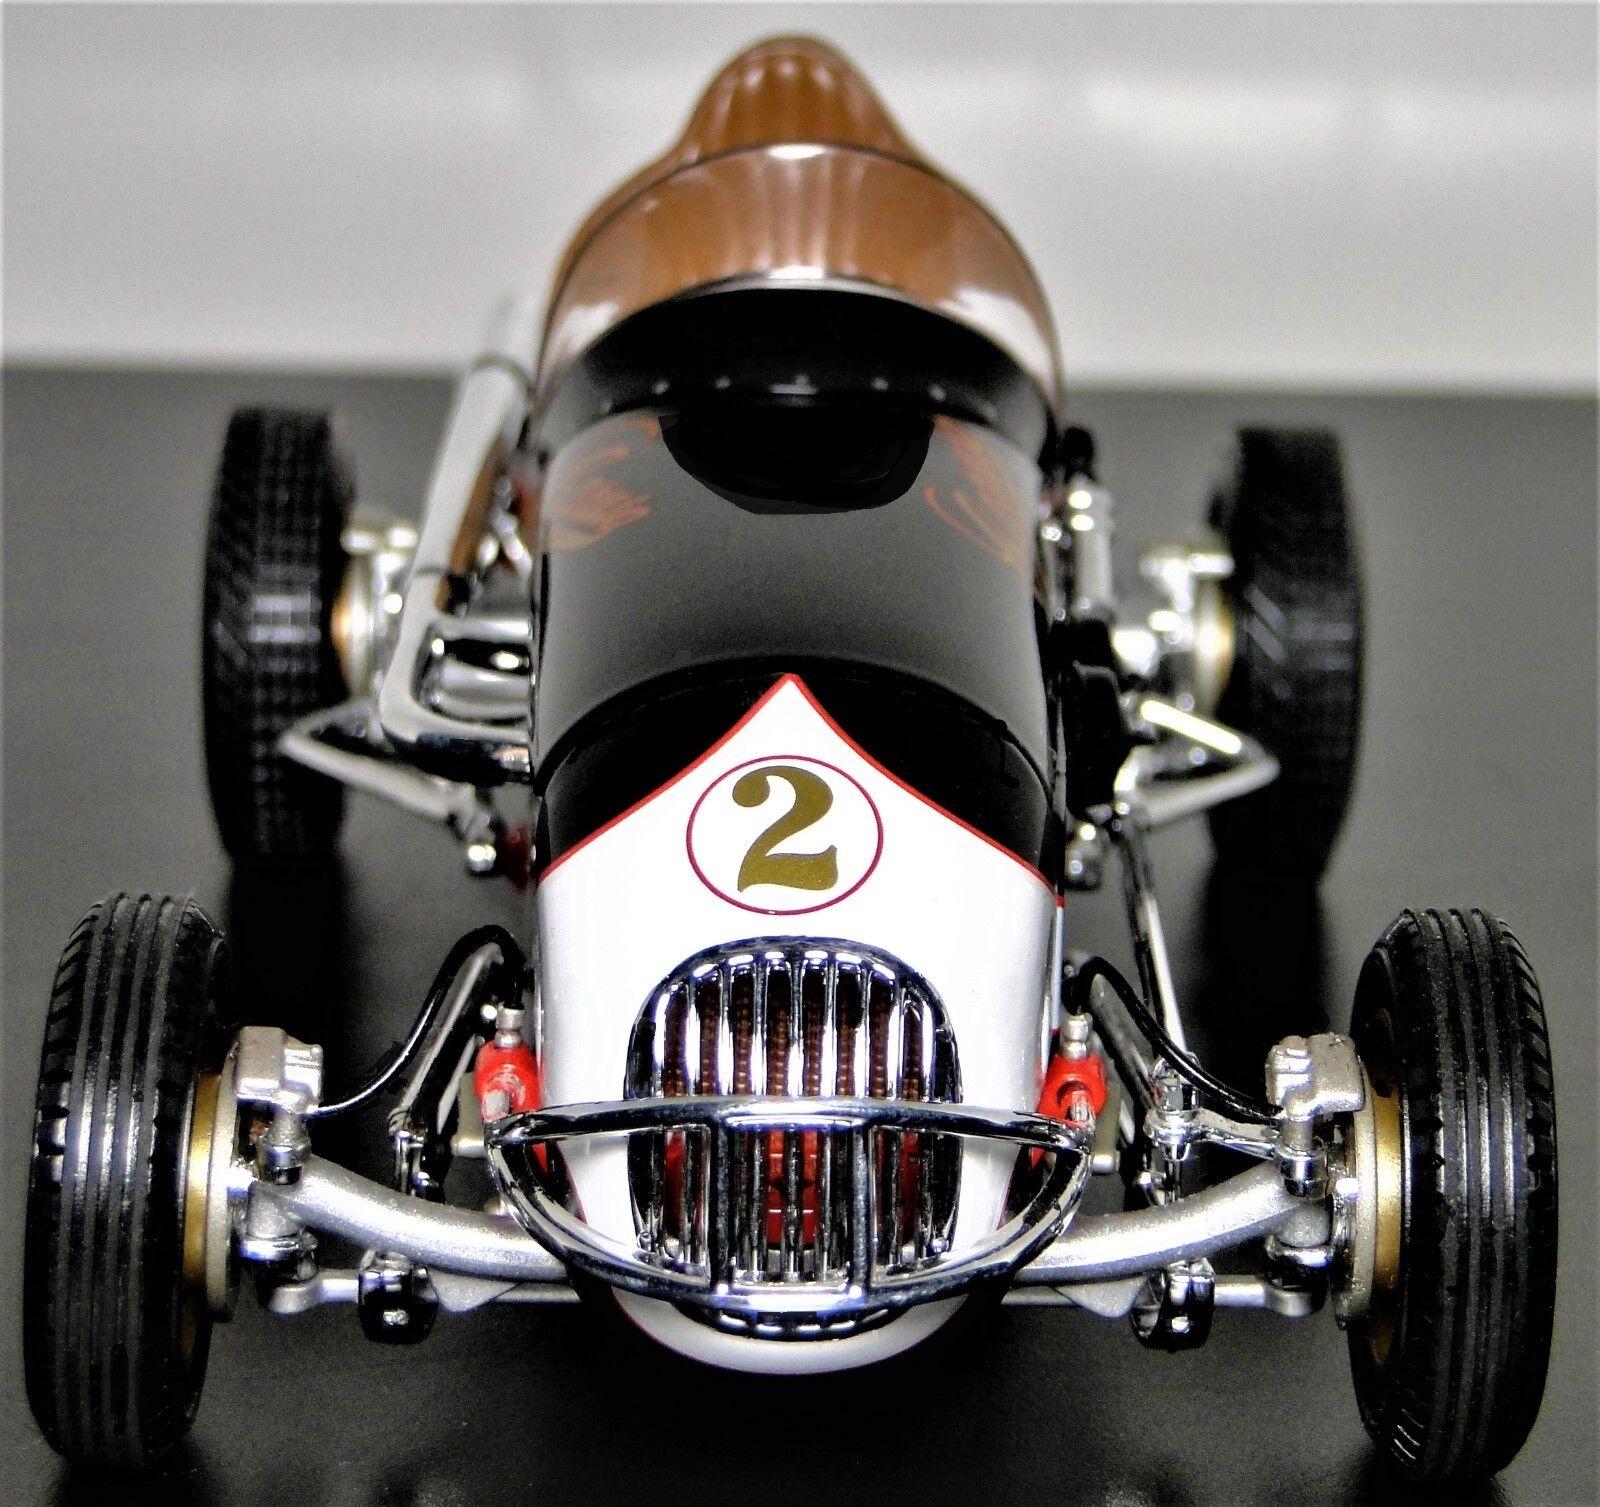 1 Race Car inspiredby Ferrari F GP 18 1960s 43 Vintage 24 Indy carrusel Negro 12